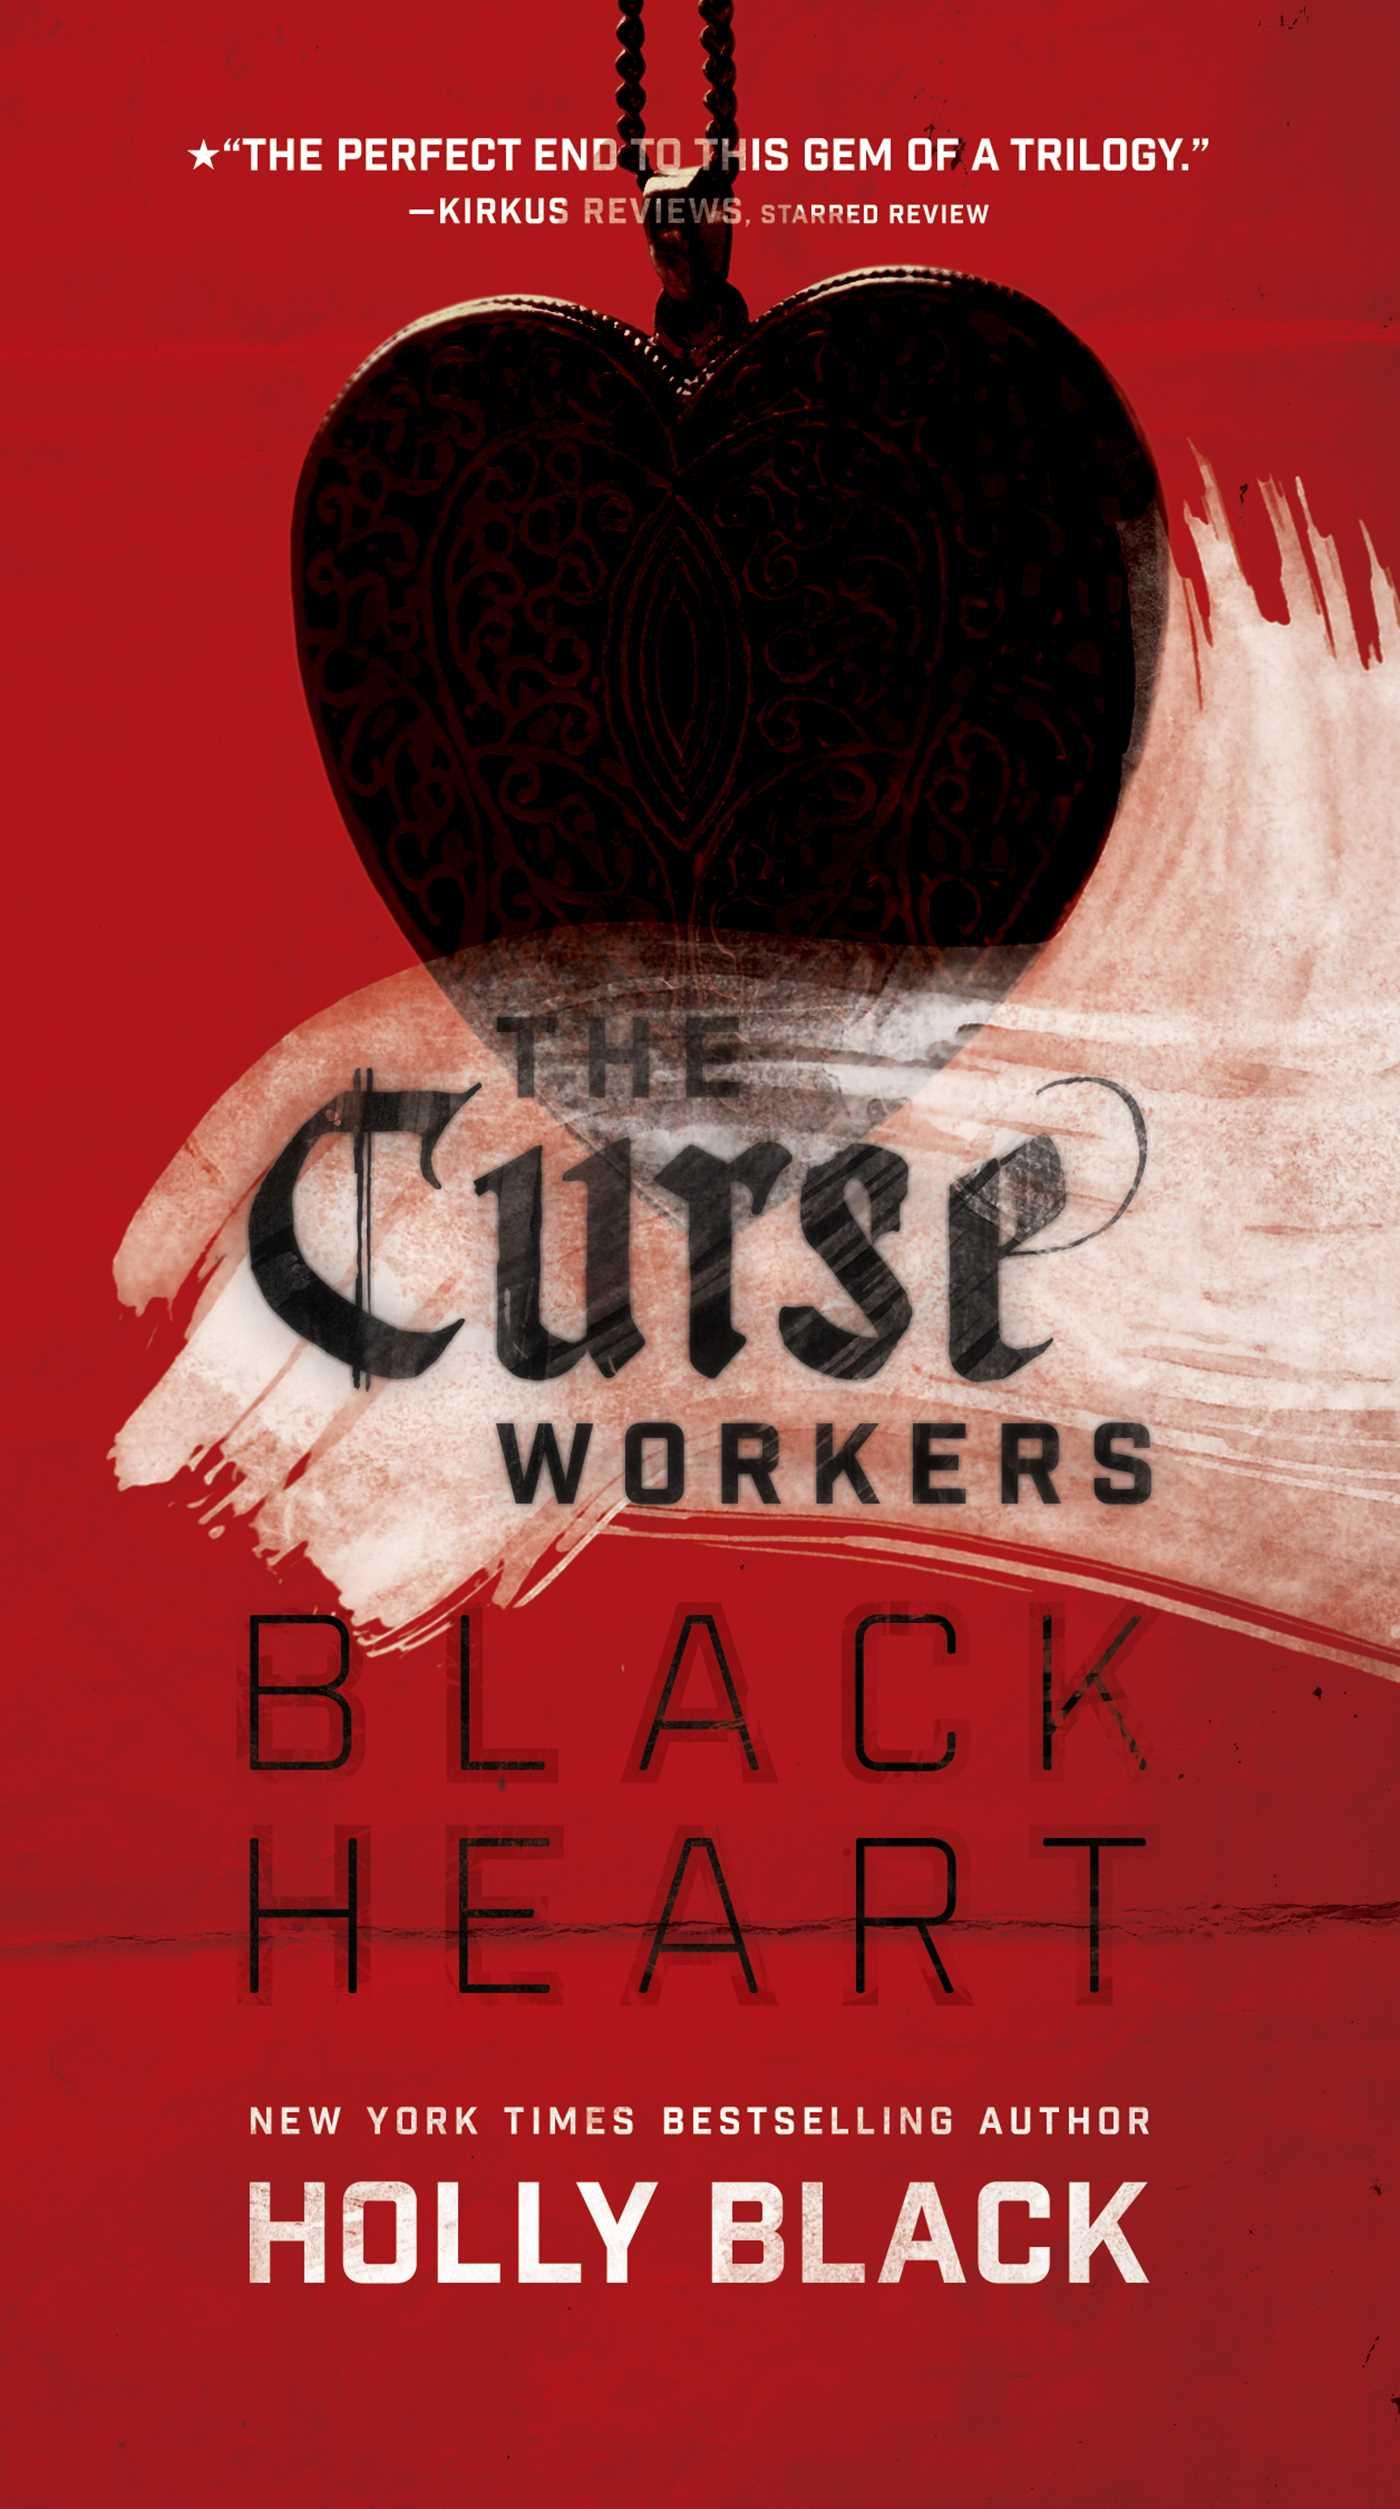 holly-black-black-heart.jpg